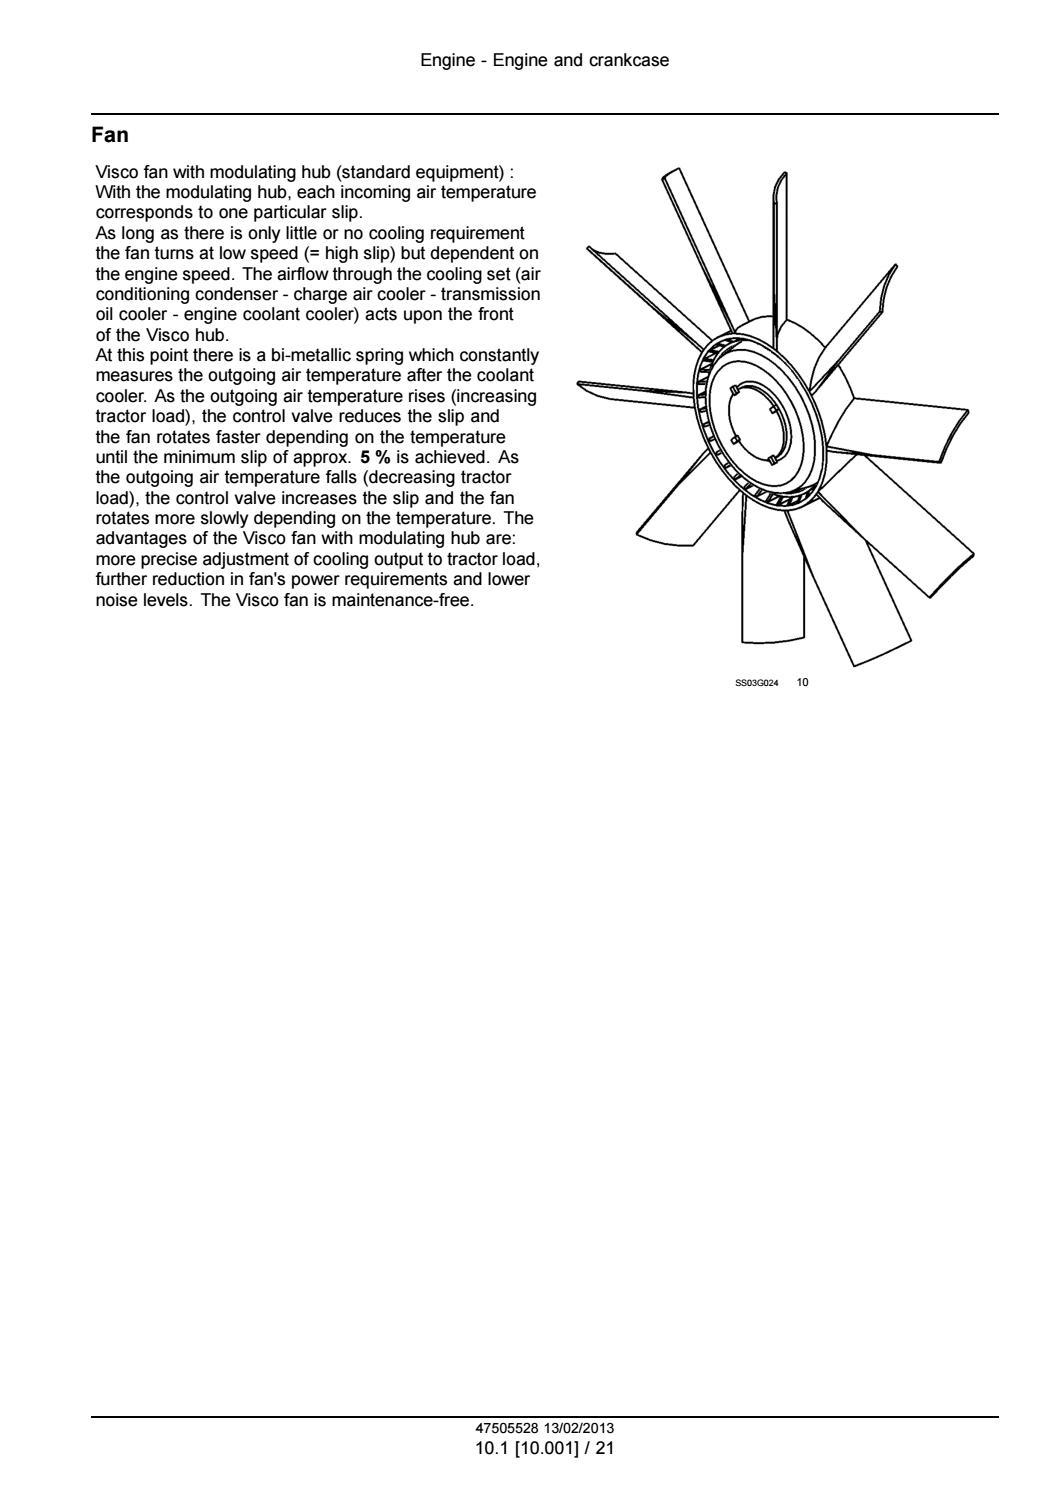 STEYR CVT 6195 Tractor Service Repair Manual by azx2nx7e